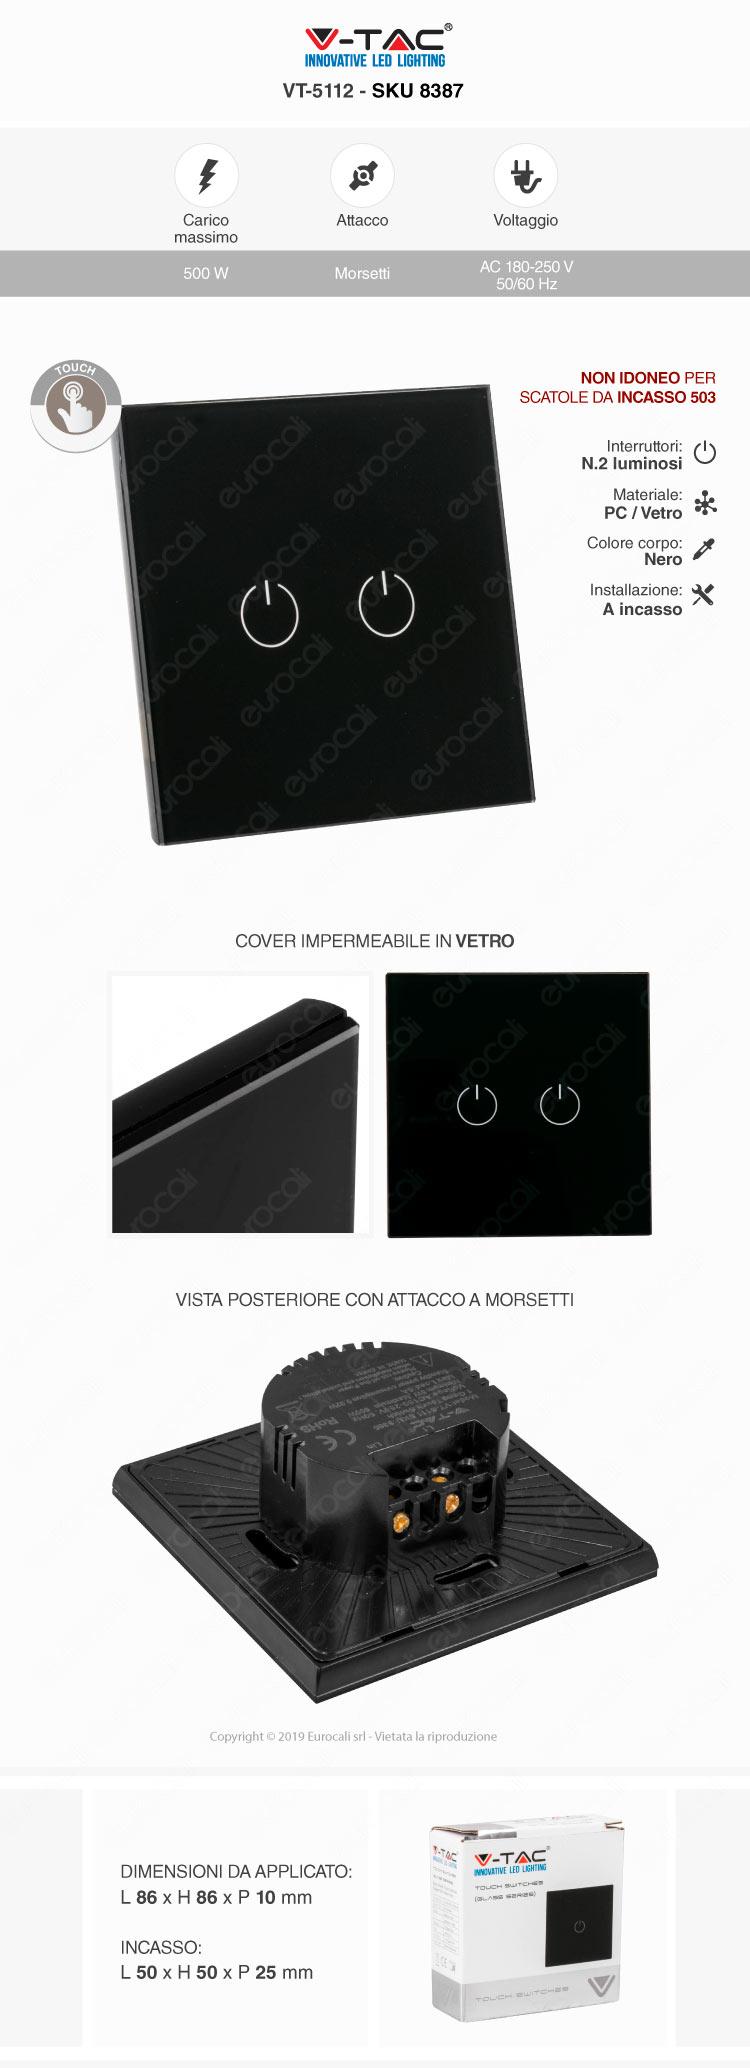 V-Tac Interruttore Touch